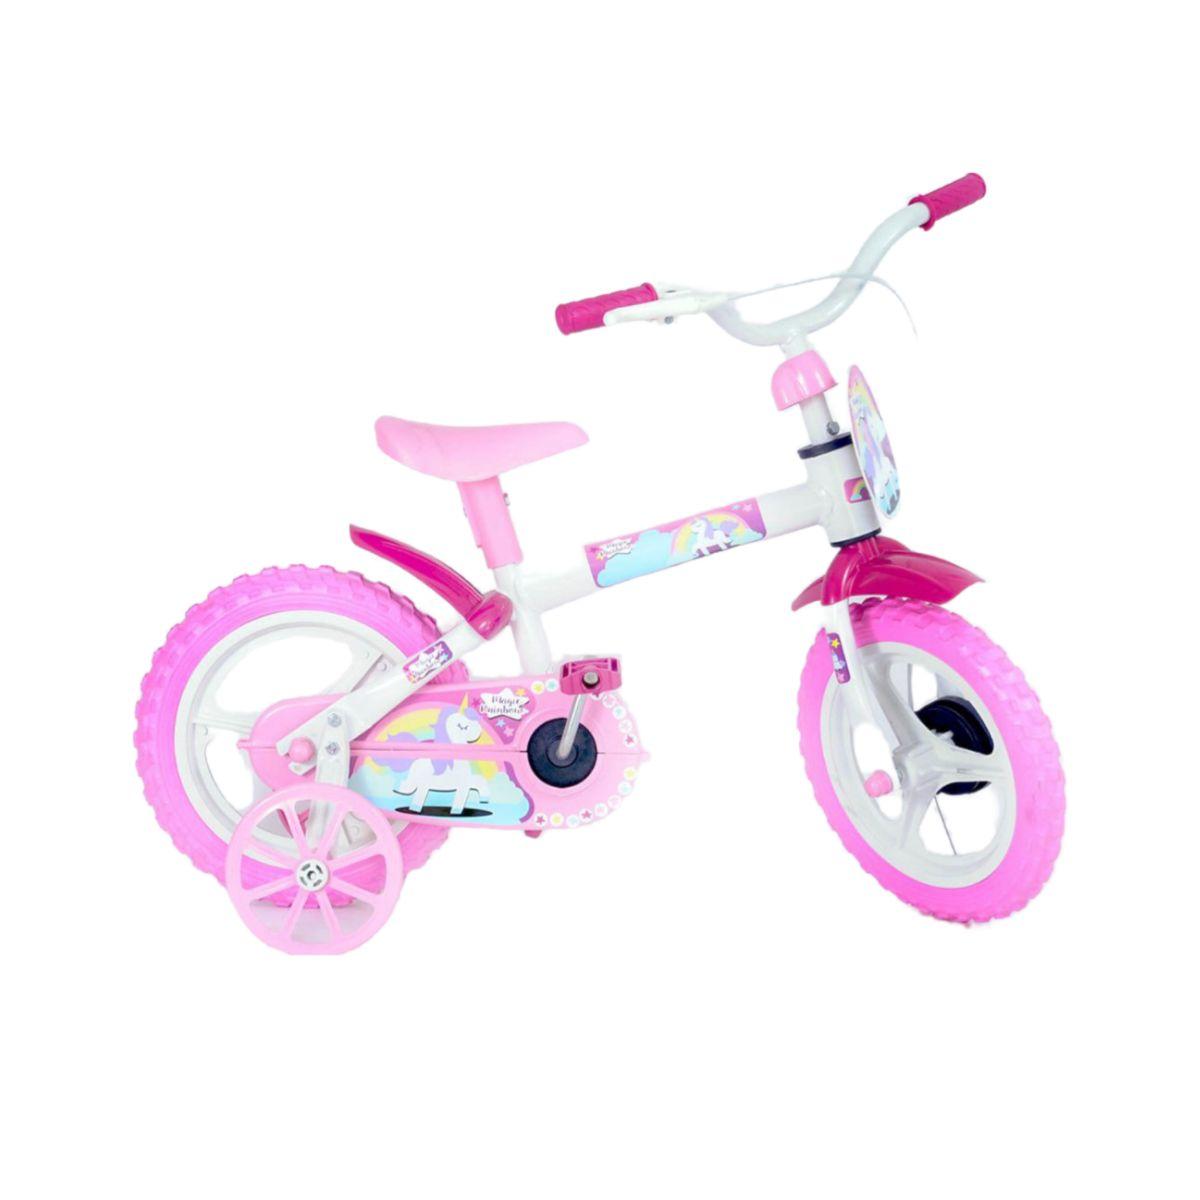 Bicicleta Aro 12 Magic Rain Bow - Bike